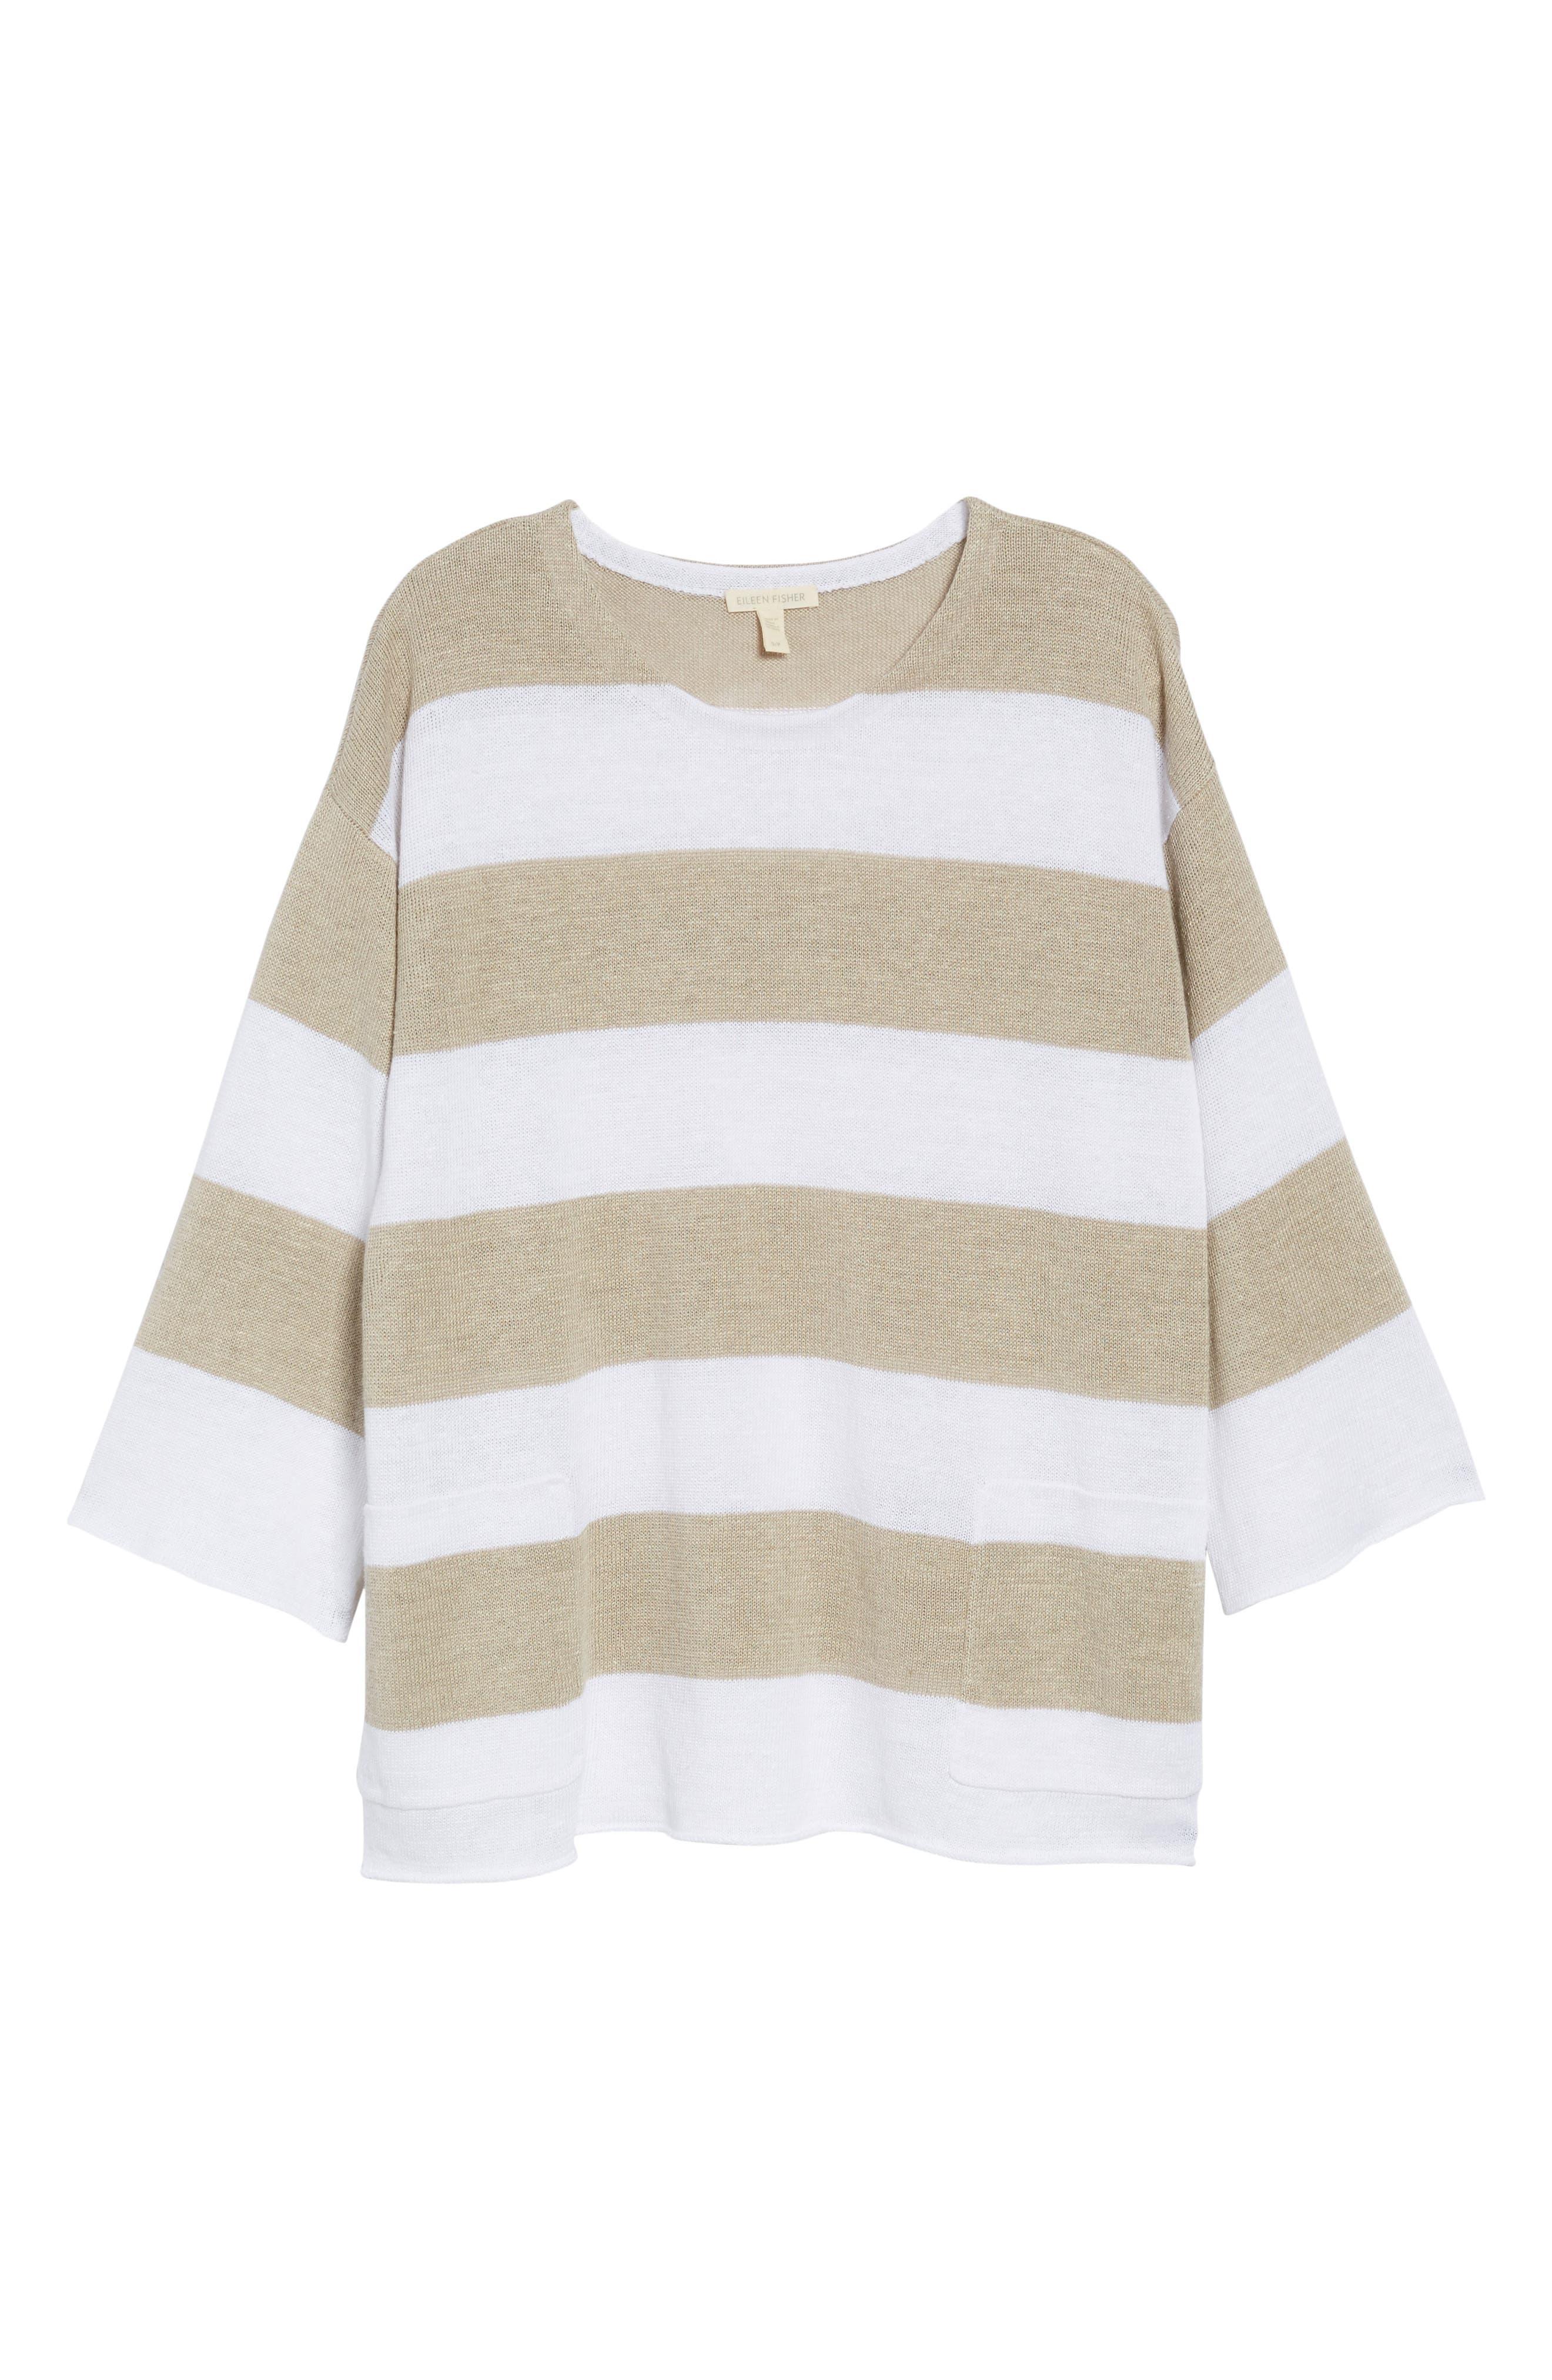 Stripe Organic Linen Knit A-Line Top,                             Alternate thumbnail 6, color,                             White/ Natural